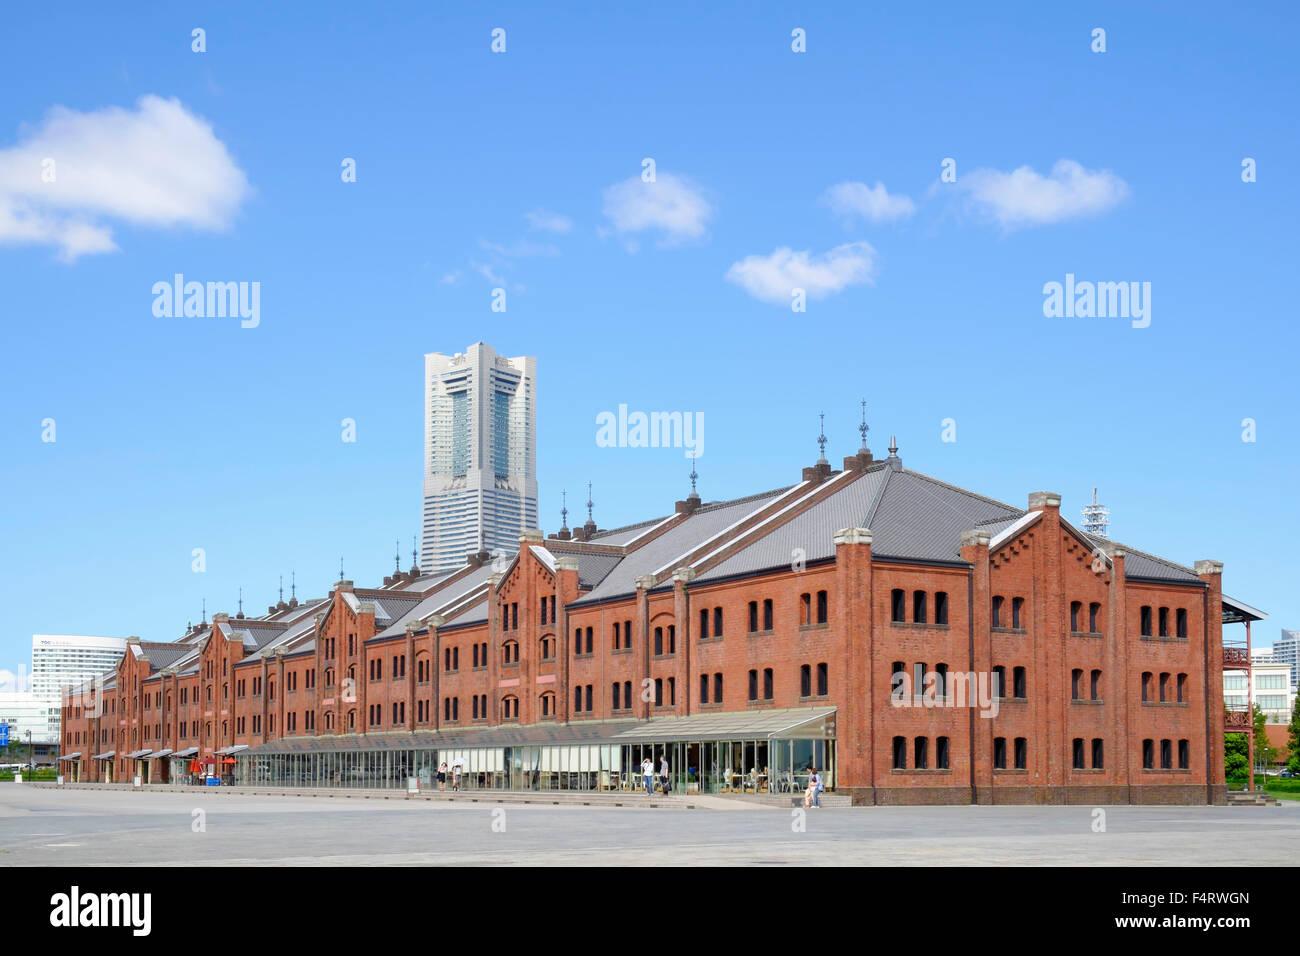 Historic Red Brick Warehouses in Yokohama Japan - Stock Image